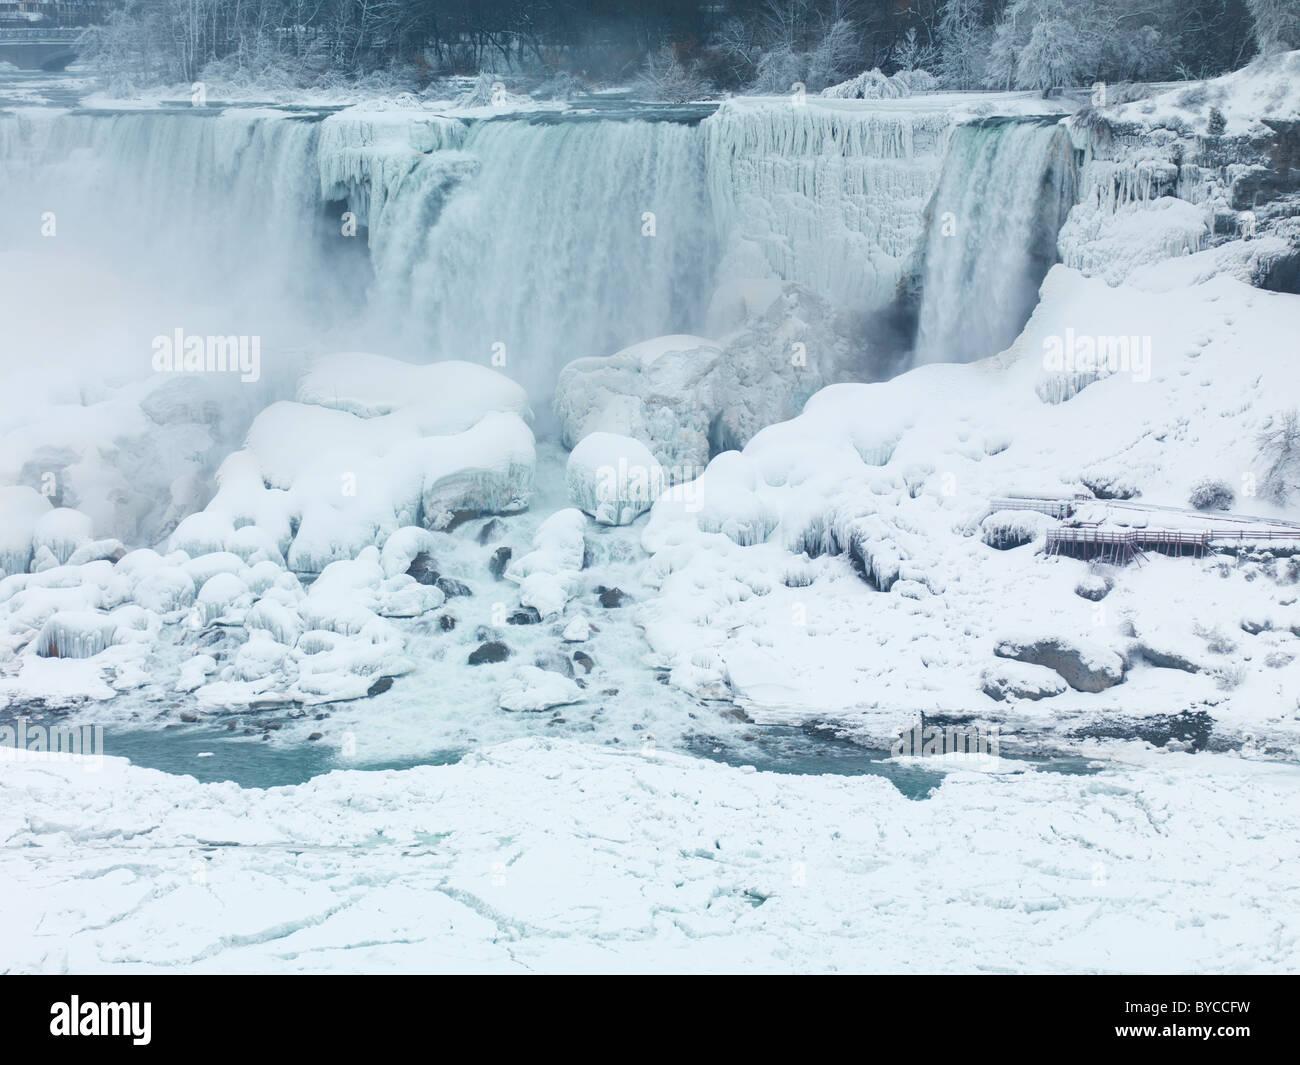 Niagara Falls American waterfall wintertime scenic. As seen from Canadian side. - Stock Image